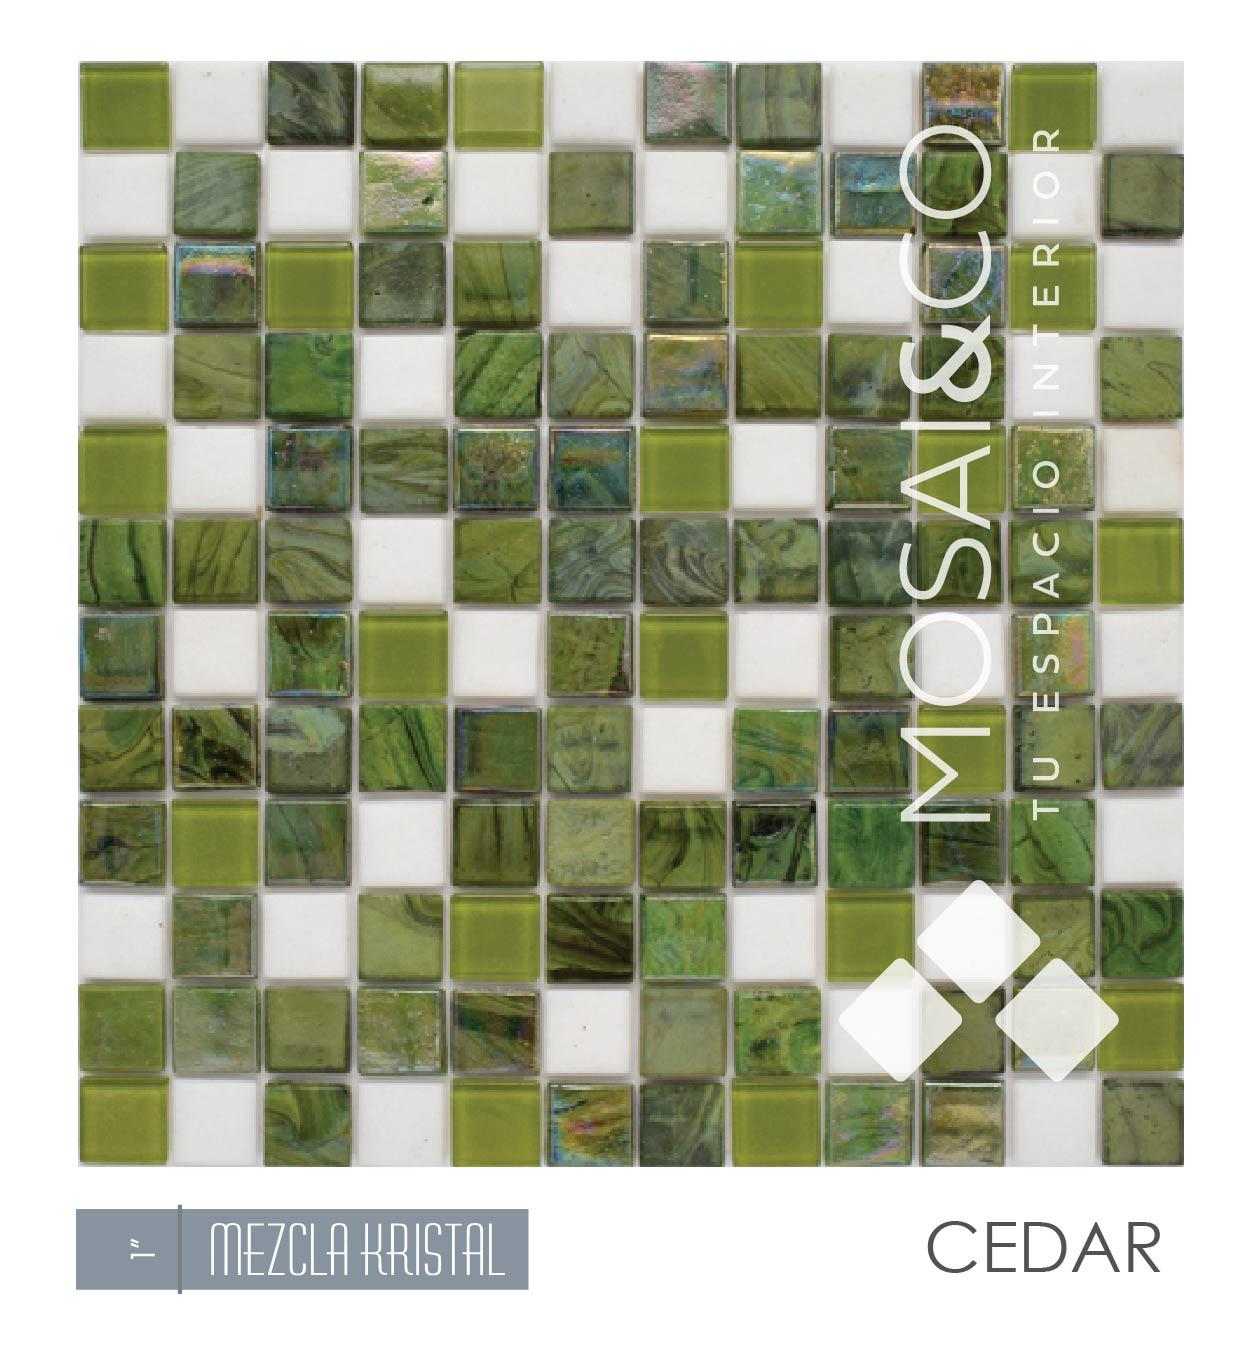 mosaico-linea-mezcla-kristal-mosaiandco-1-cedar